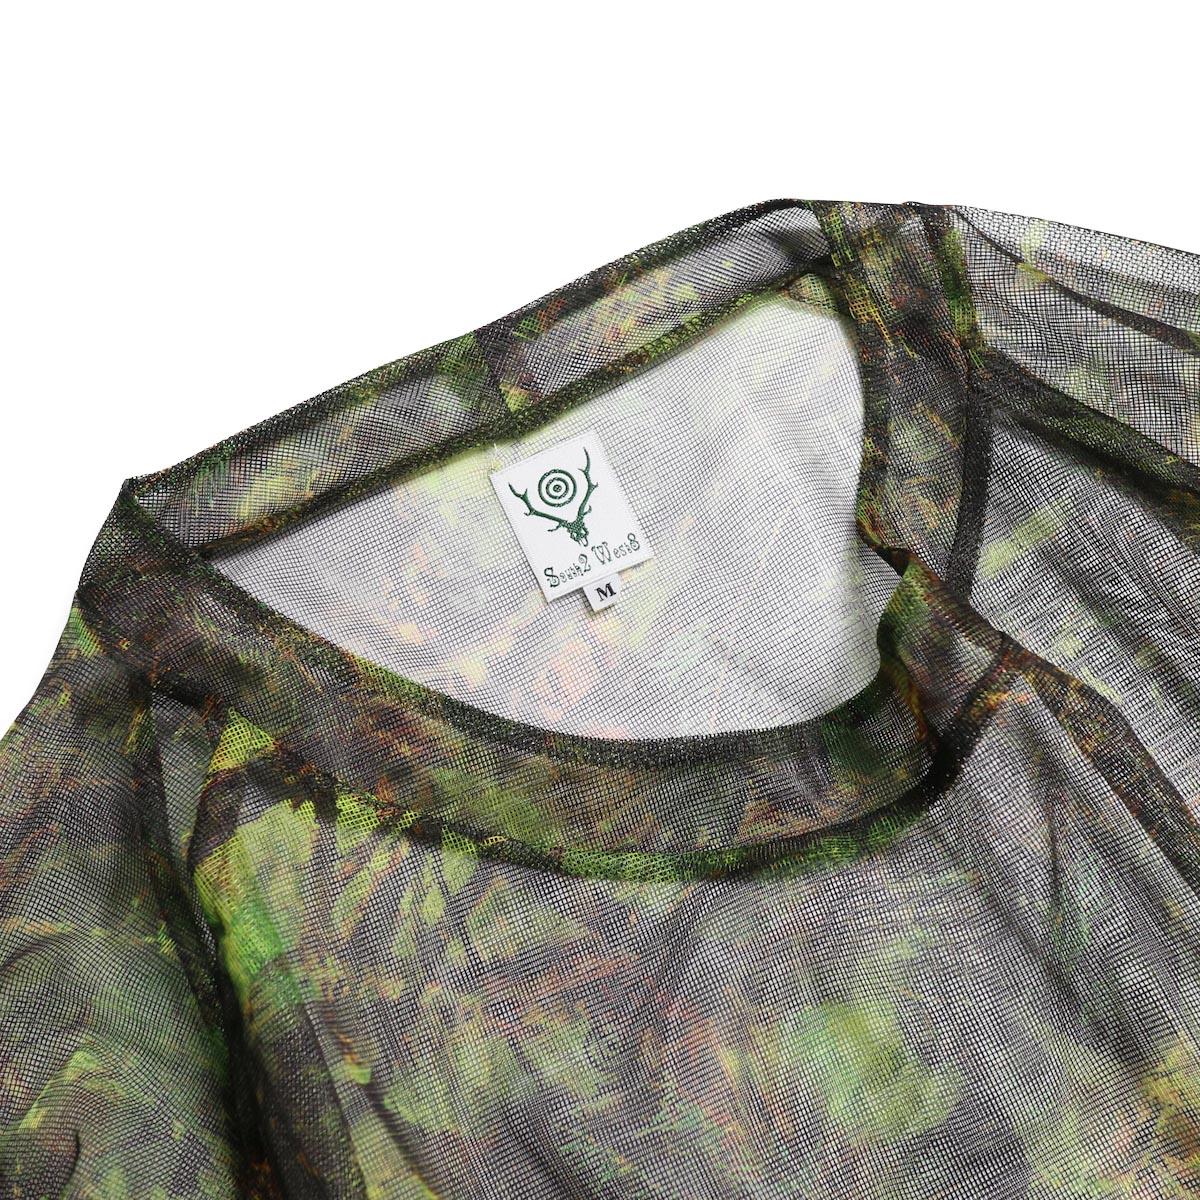 SOUTH2 WEST8 / Bush Shirt -Mesh Print (S2W8 Camo) 首元